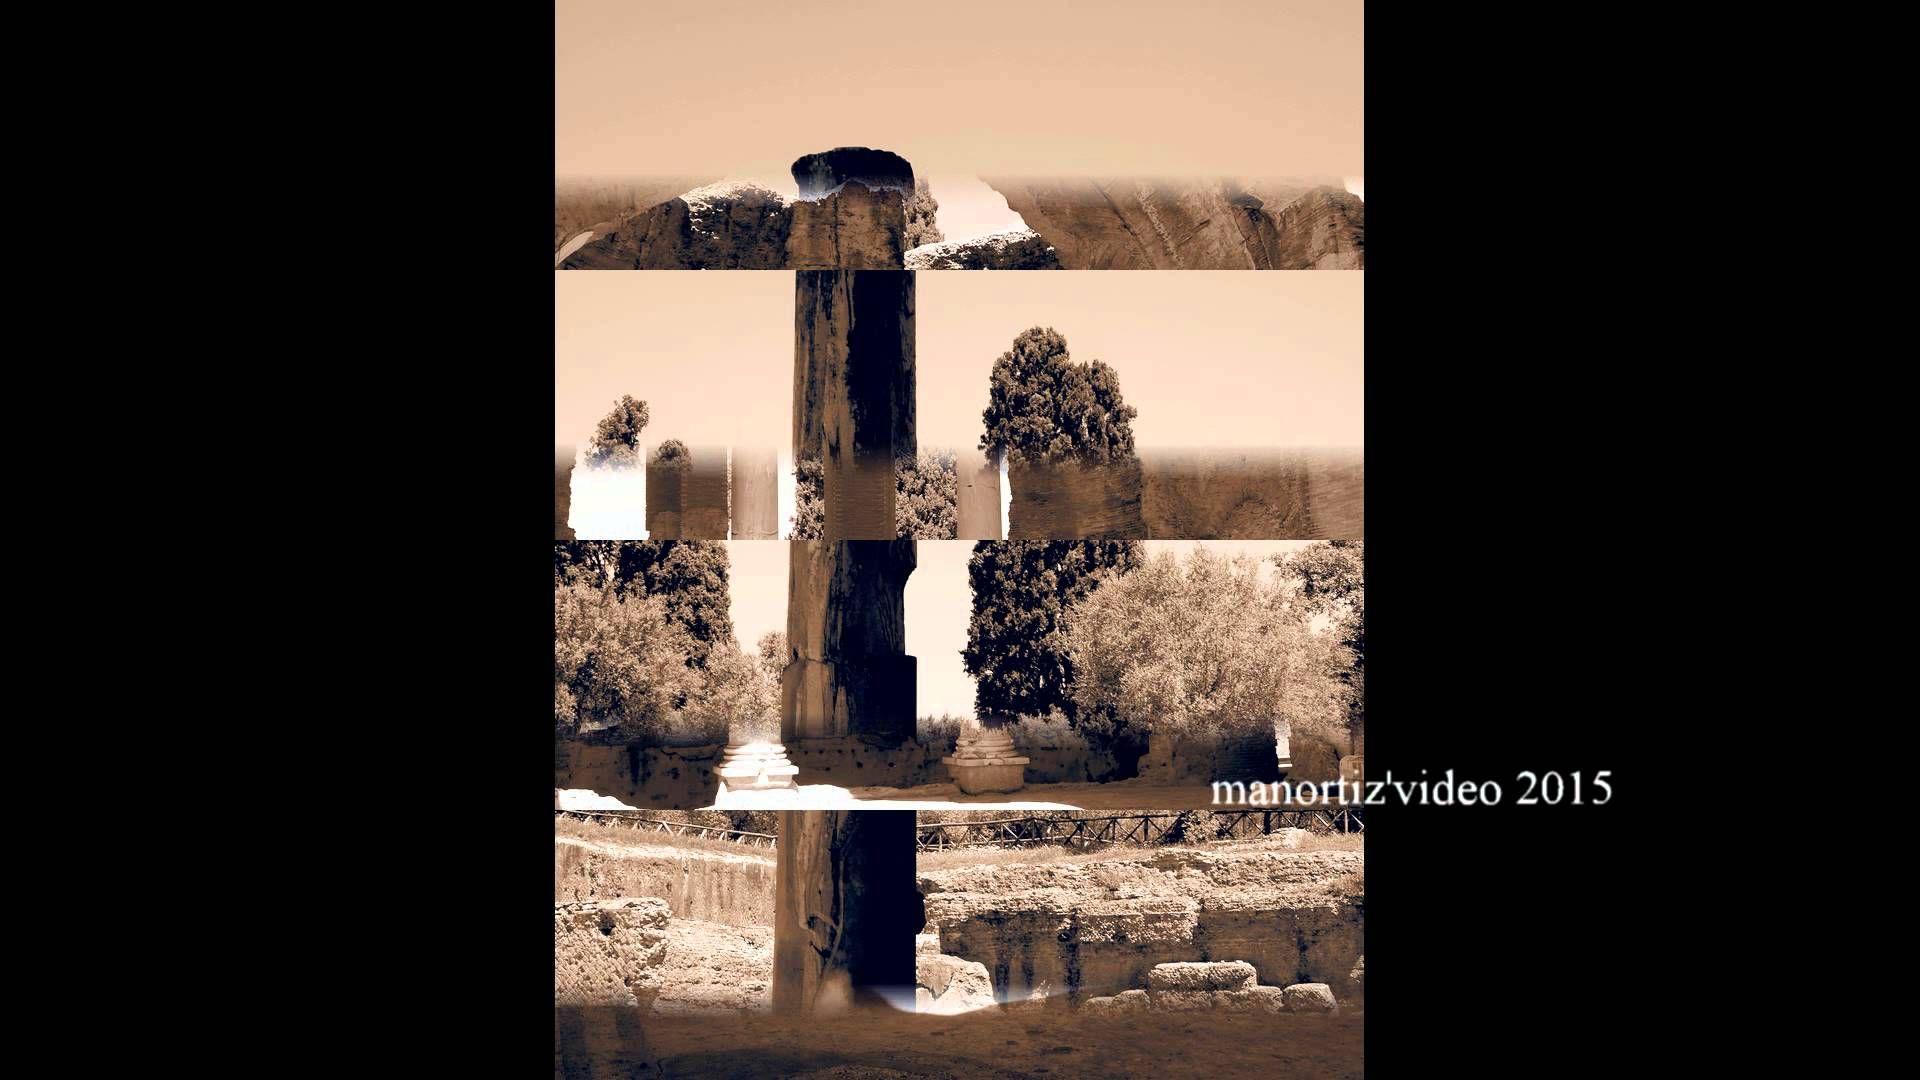 Hadrian's Villa - Tivoli Villa Adriana: Grandi Terme in HD 1080 (manortiz)